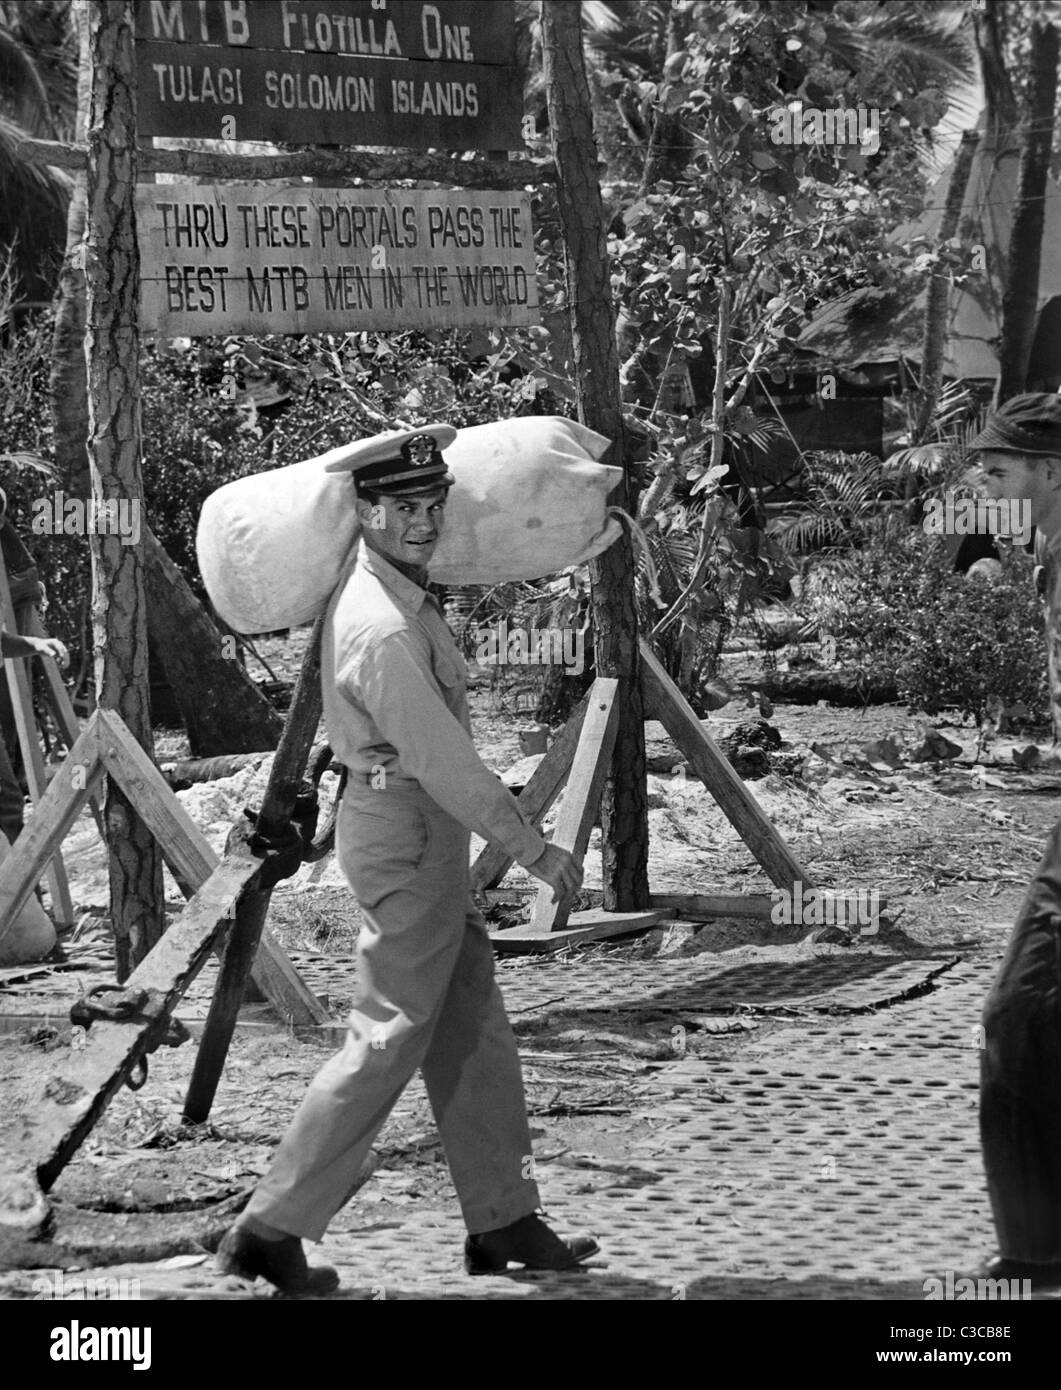 CLIFF ROBERTSON PT 109 (1963) - Stock Image